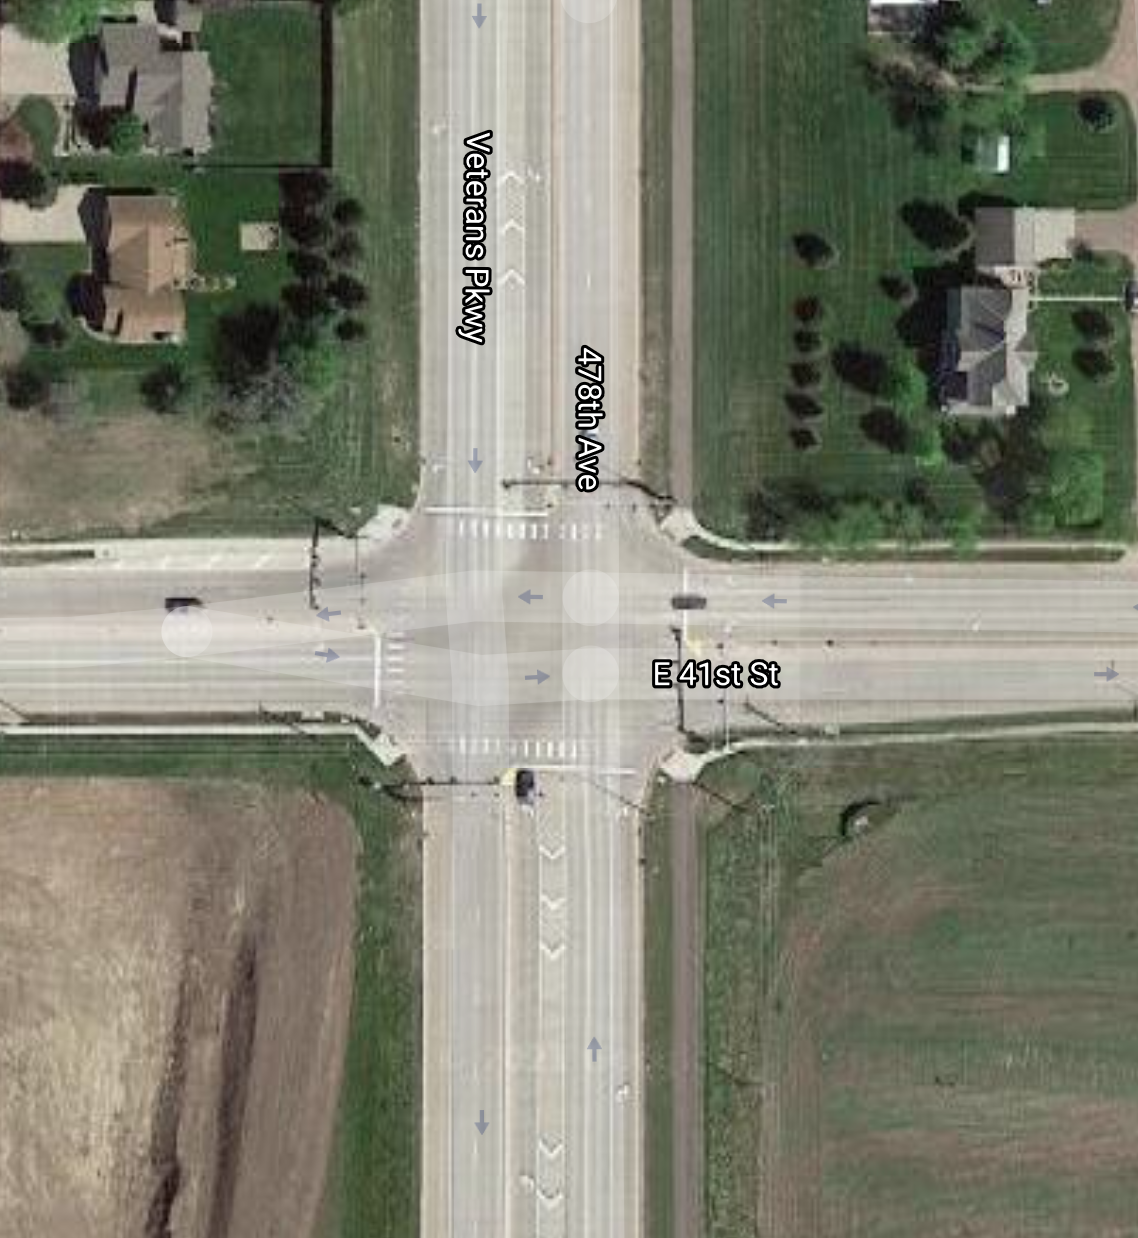 Birds-eye view of 41st Street and Highway 11 (aka Veterans Parkway) via Google Maps.